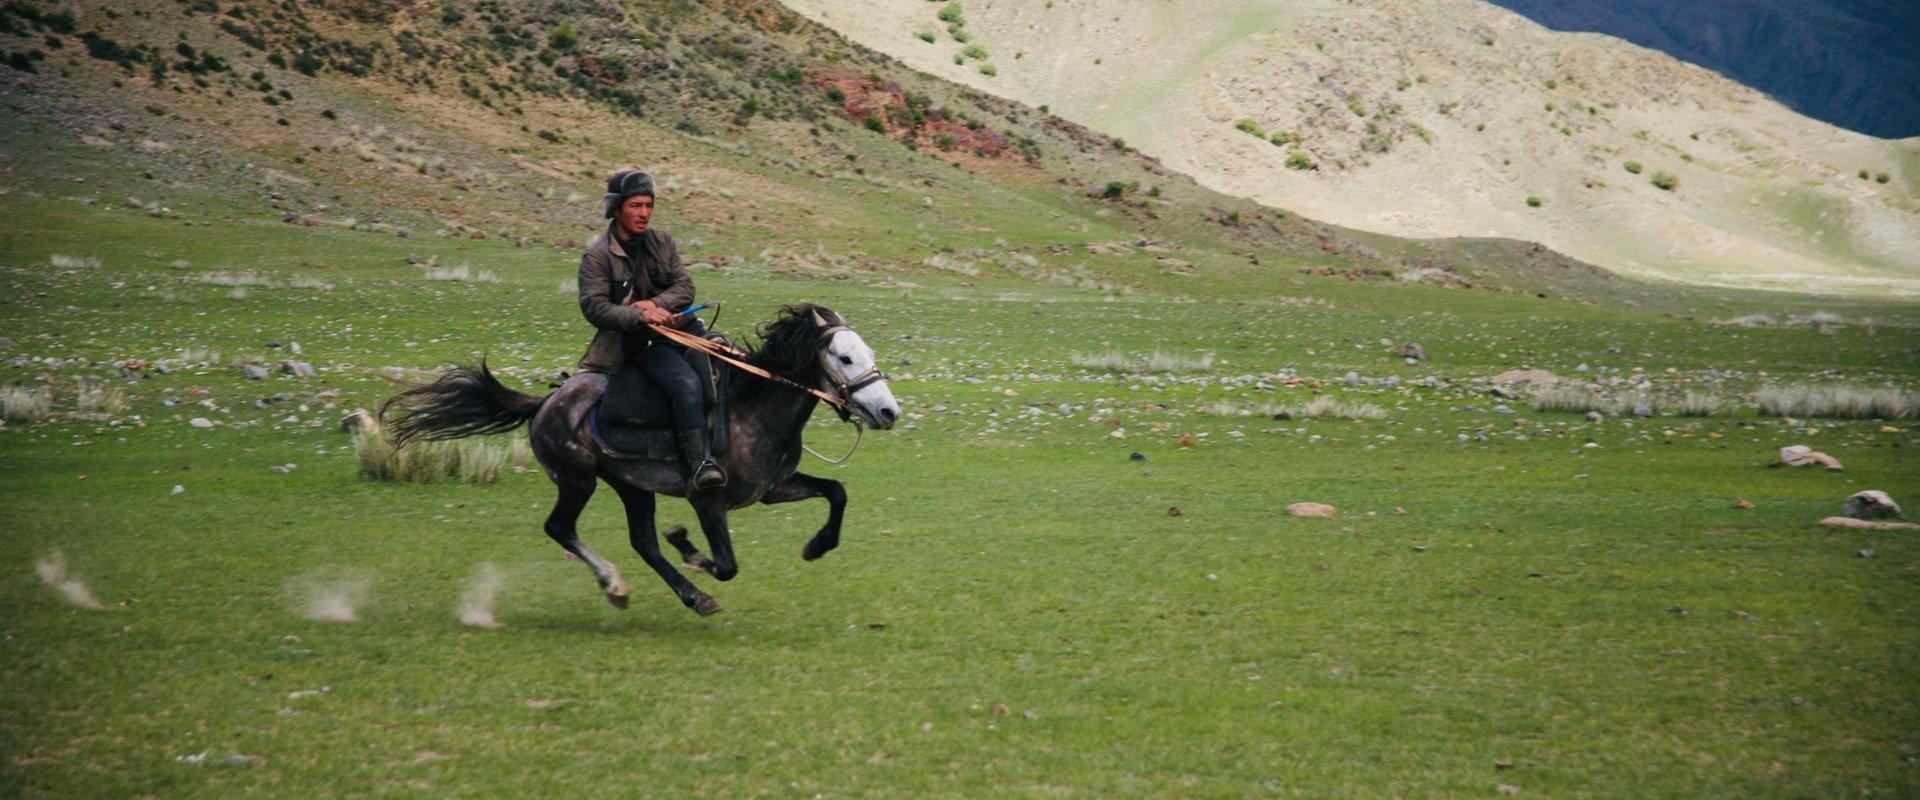 vimff fall series mountain culture show my horse my destiny title bg